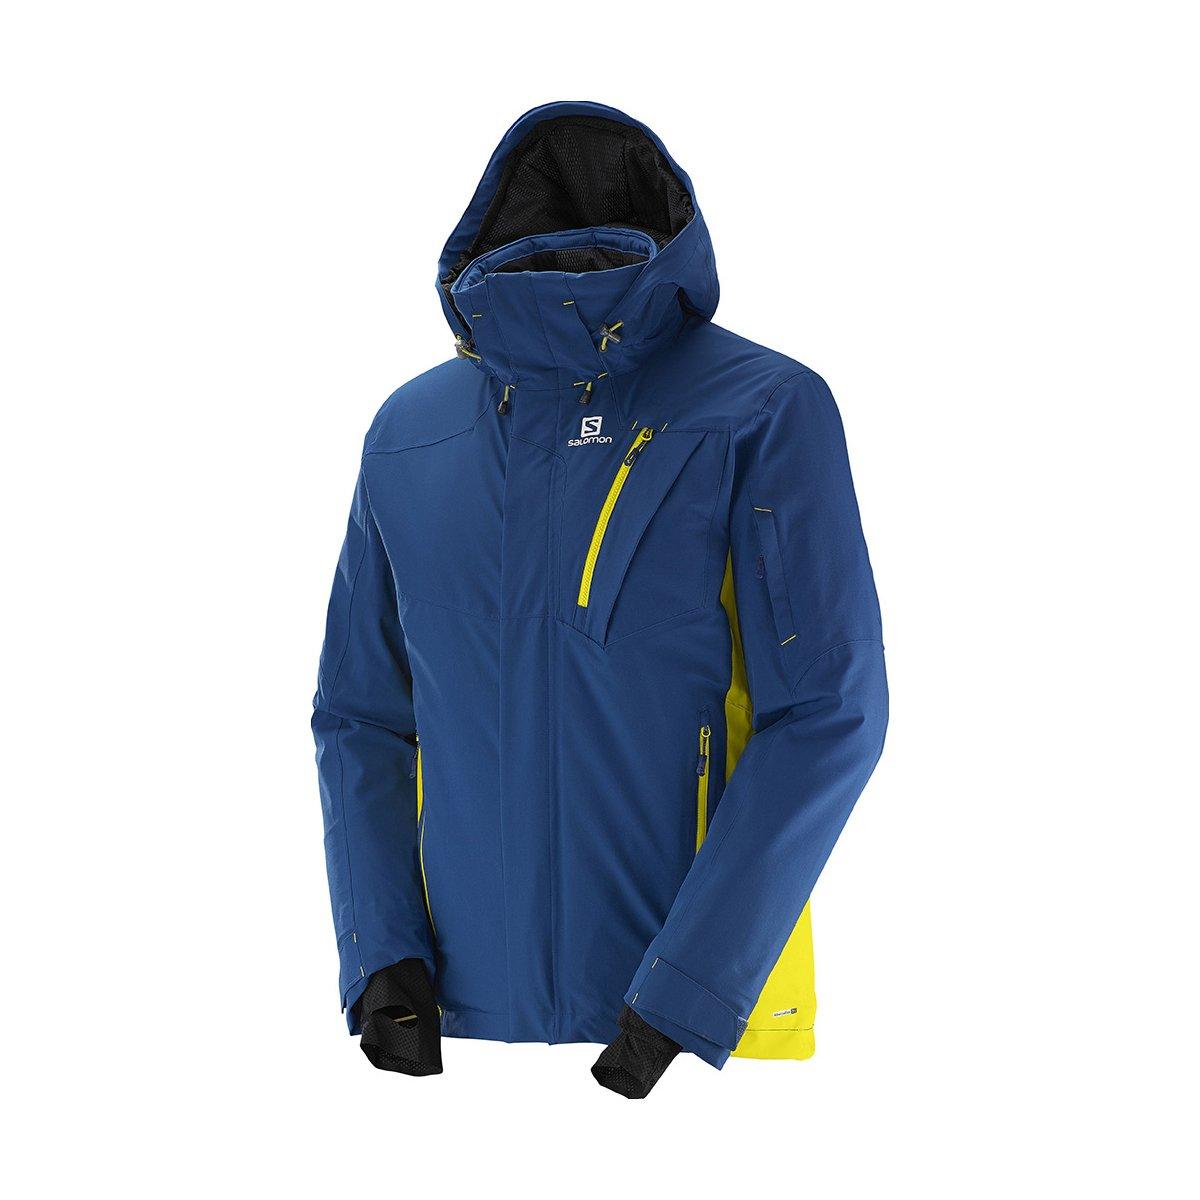 Salomon Iceglory Jacket M Midnight Blue 15/16